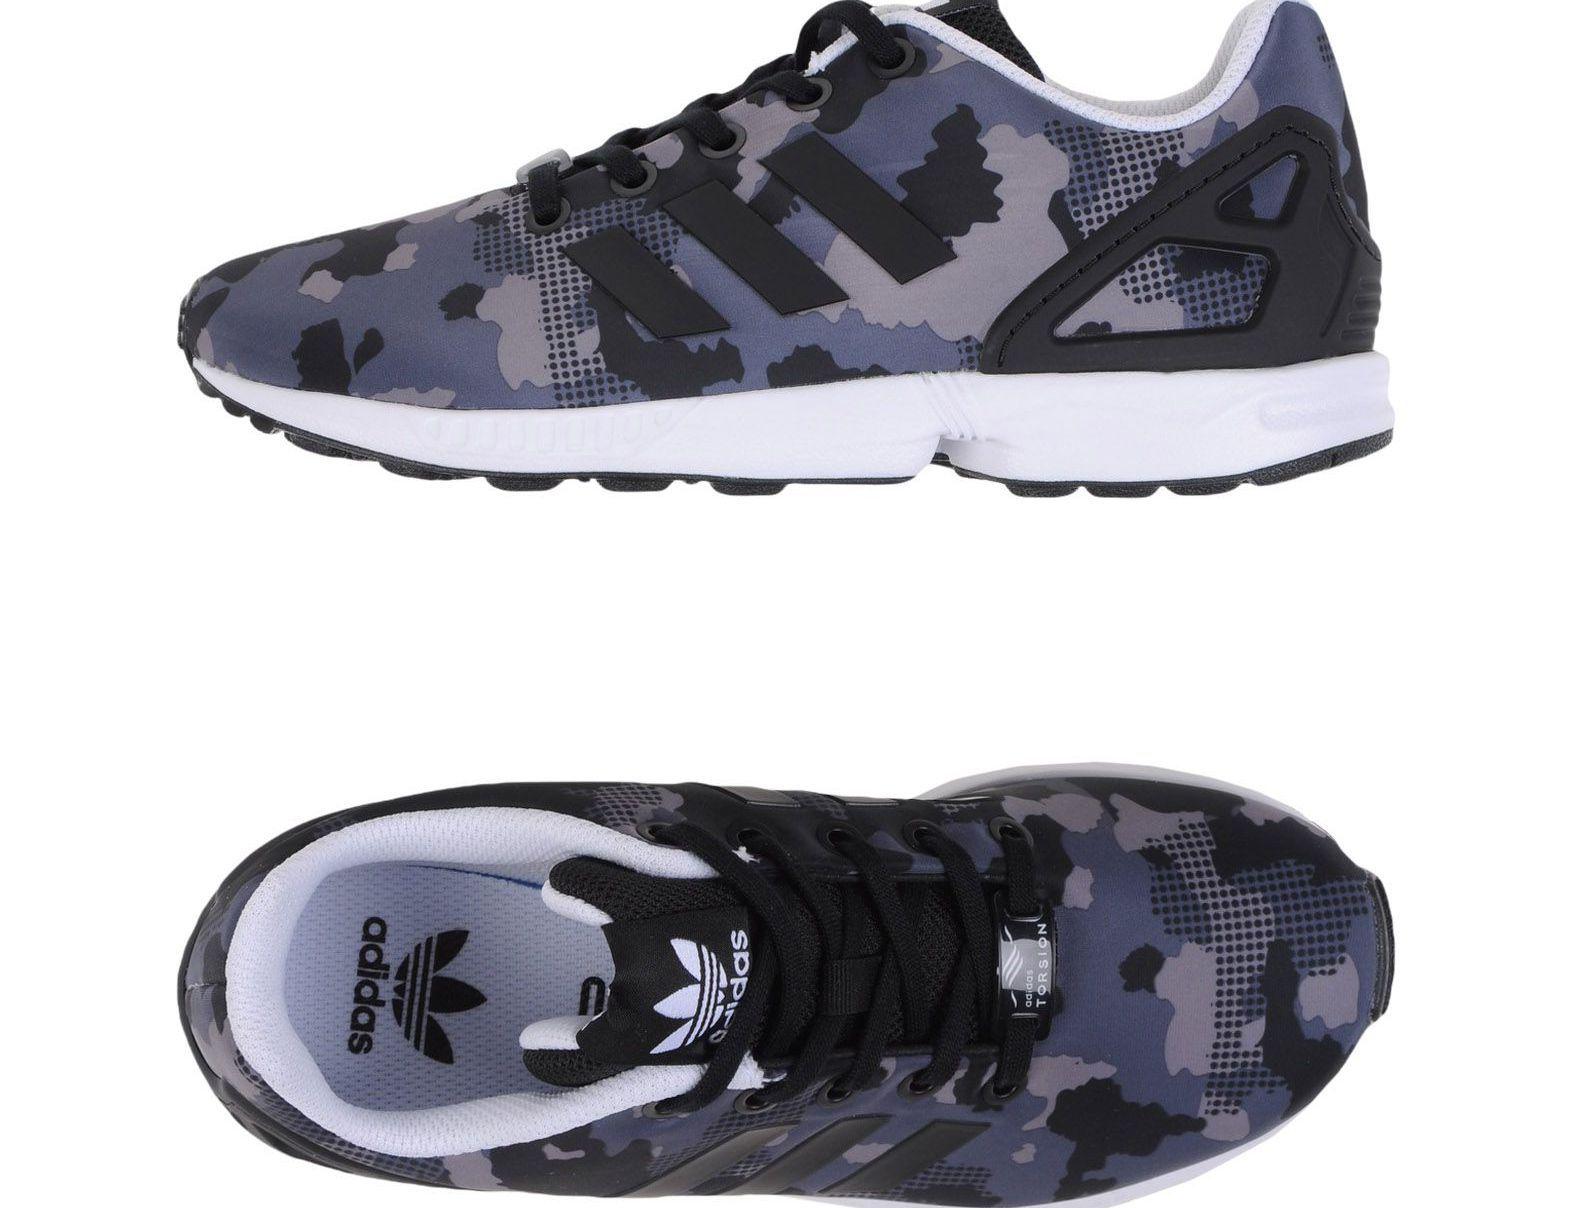 new style dce8d 7ffd0 ADIDAS ORIGINALS ΠΑΠΟΥΤΣΙΑ Παπούτσια τένις χαμηλά μόνο 70.00€  sale  style   fashion